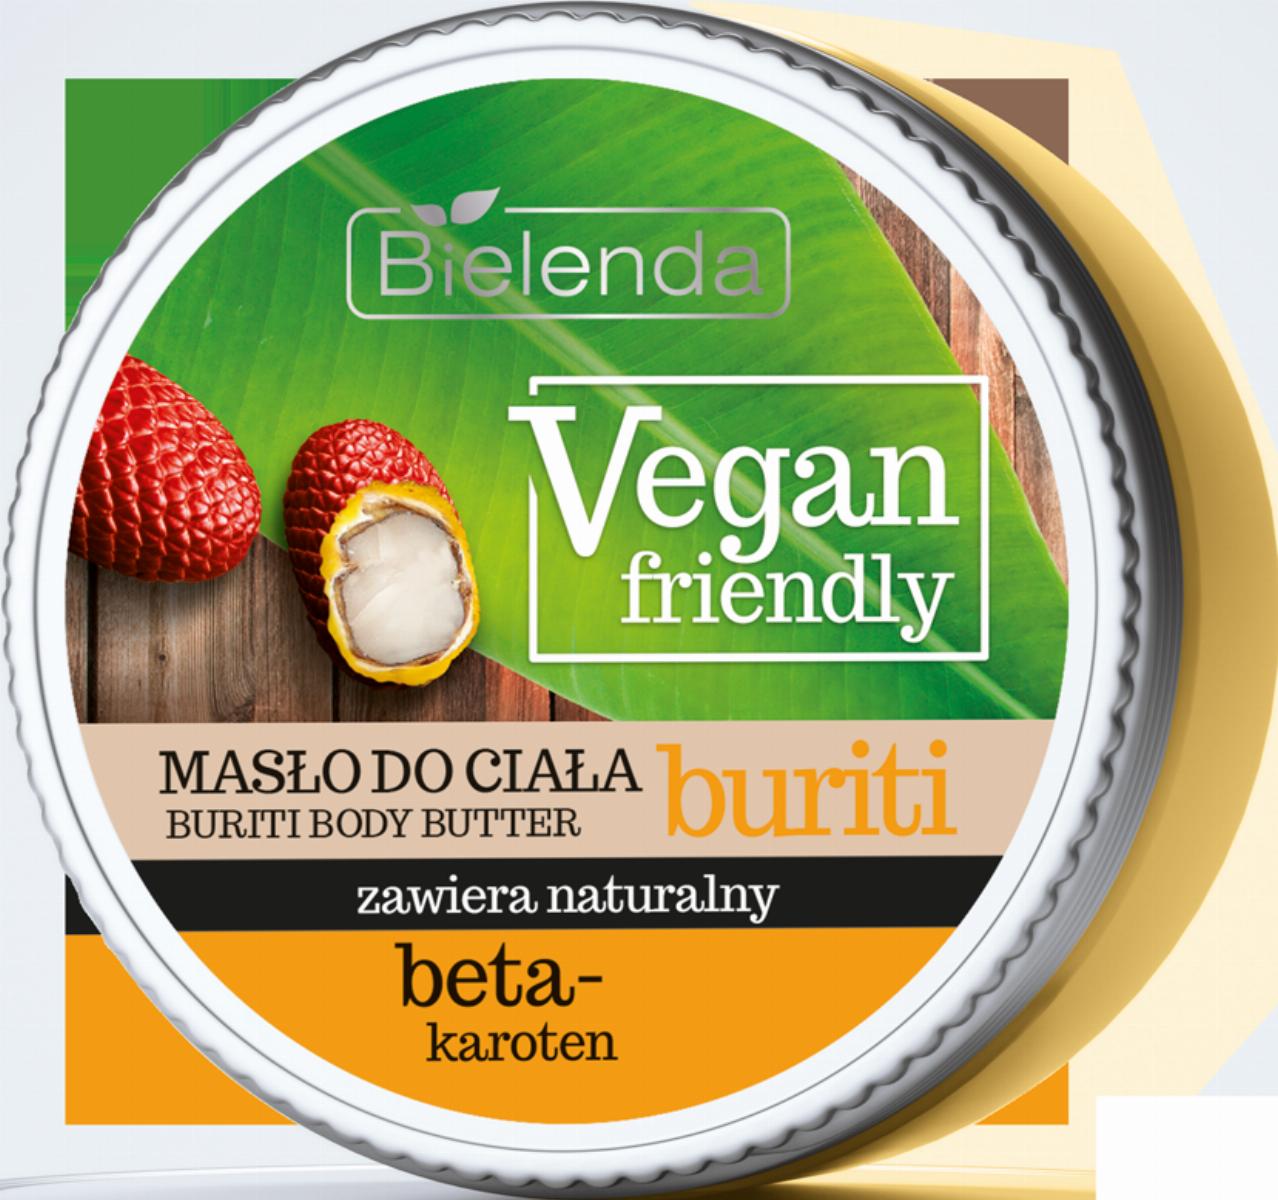 bielenda-vegan-friendly-maslo-do-ciala-buriti-1